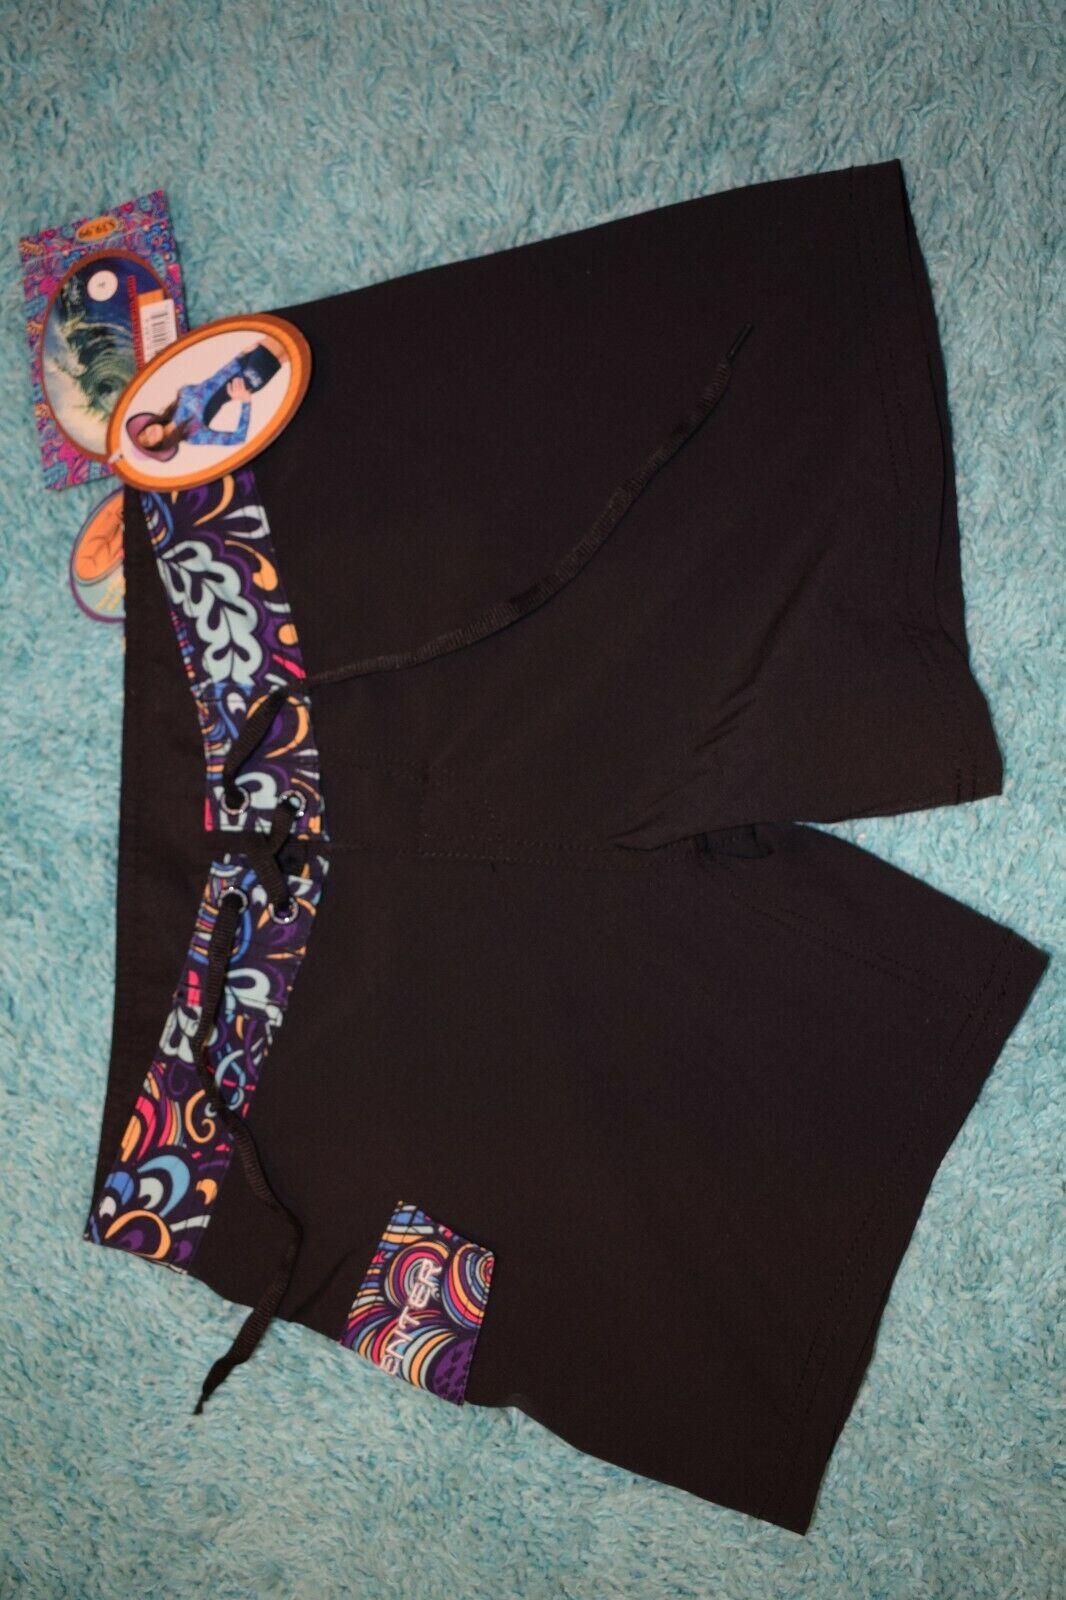 Women's Tormenter Board Shorts Black/Mulitcolor size 4